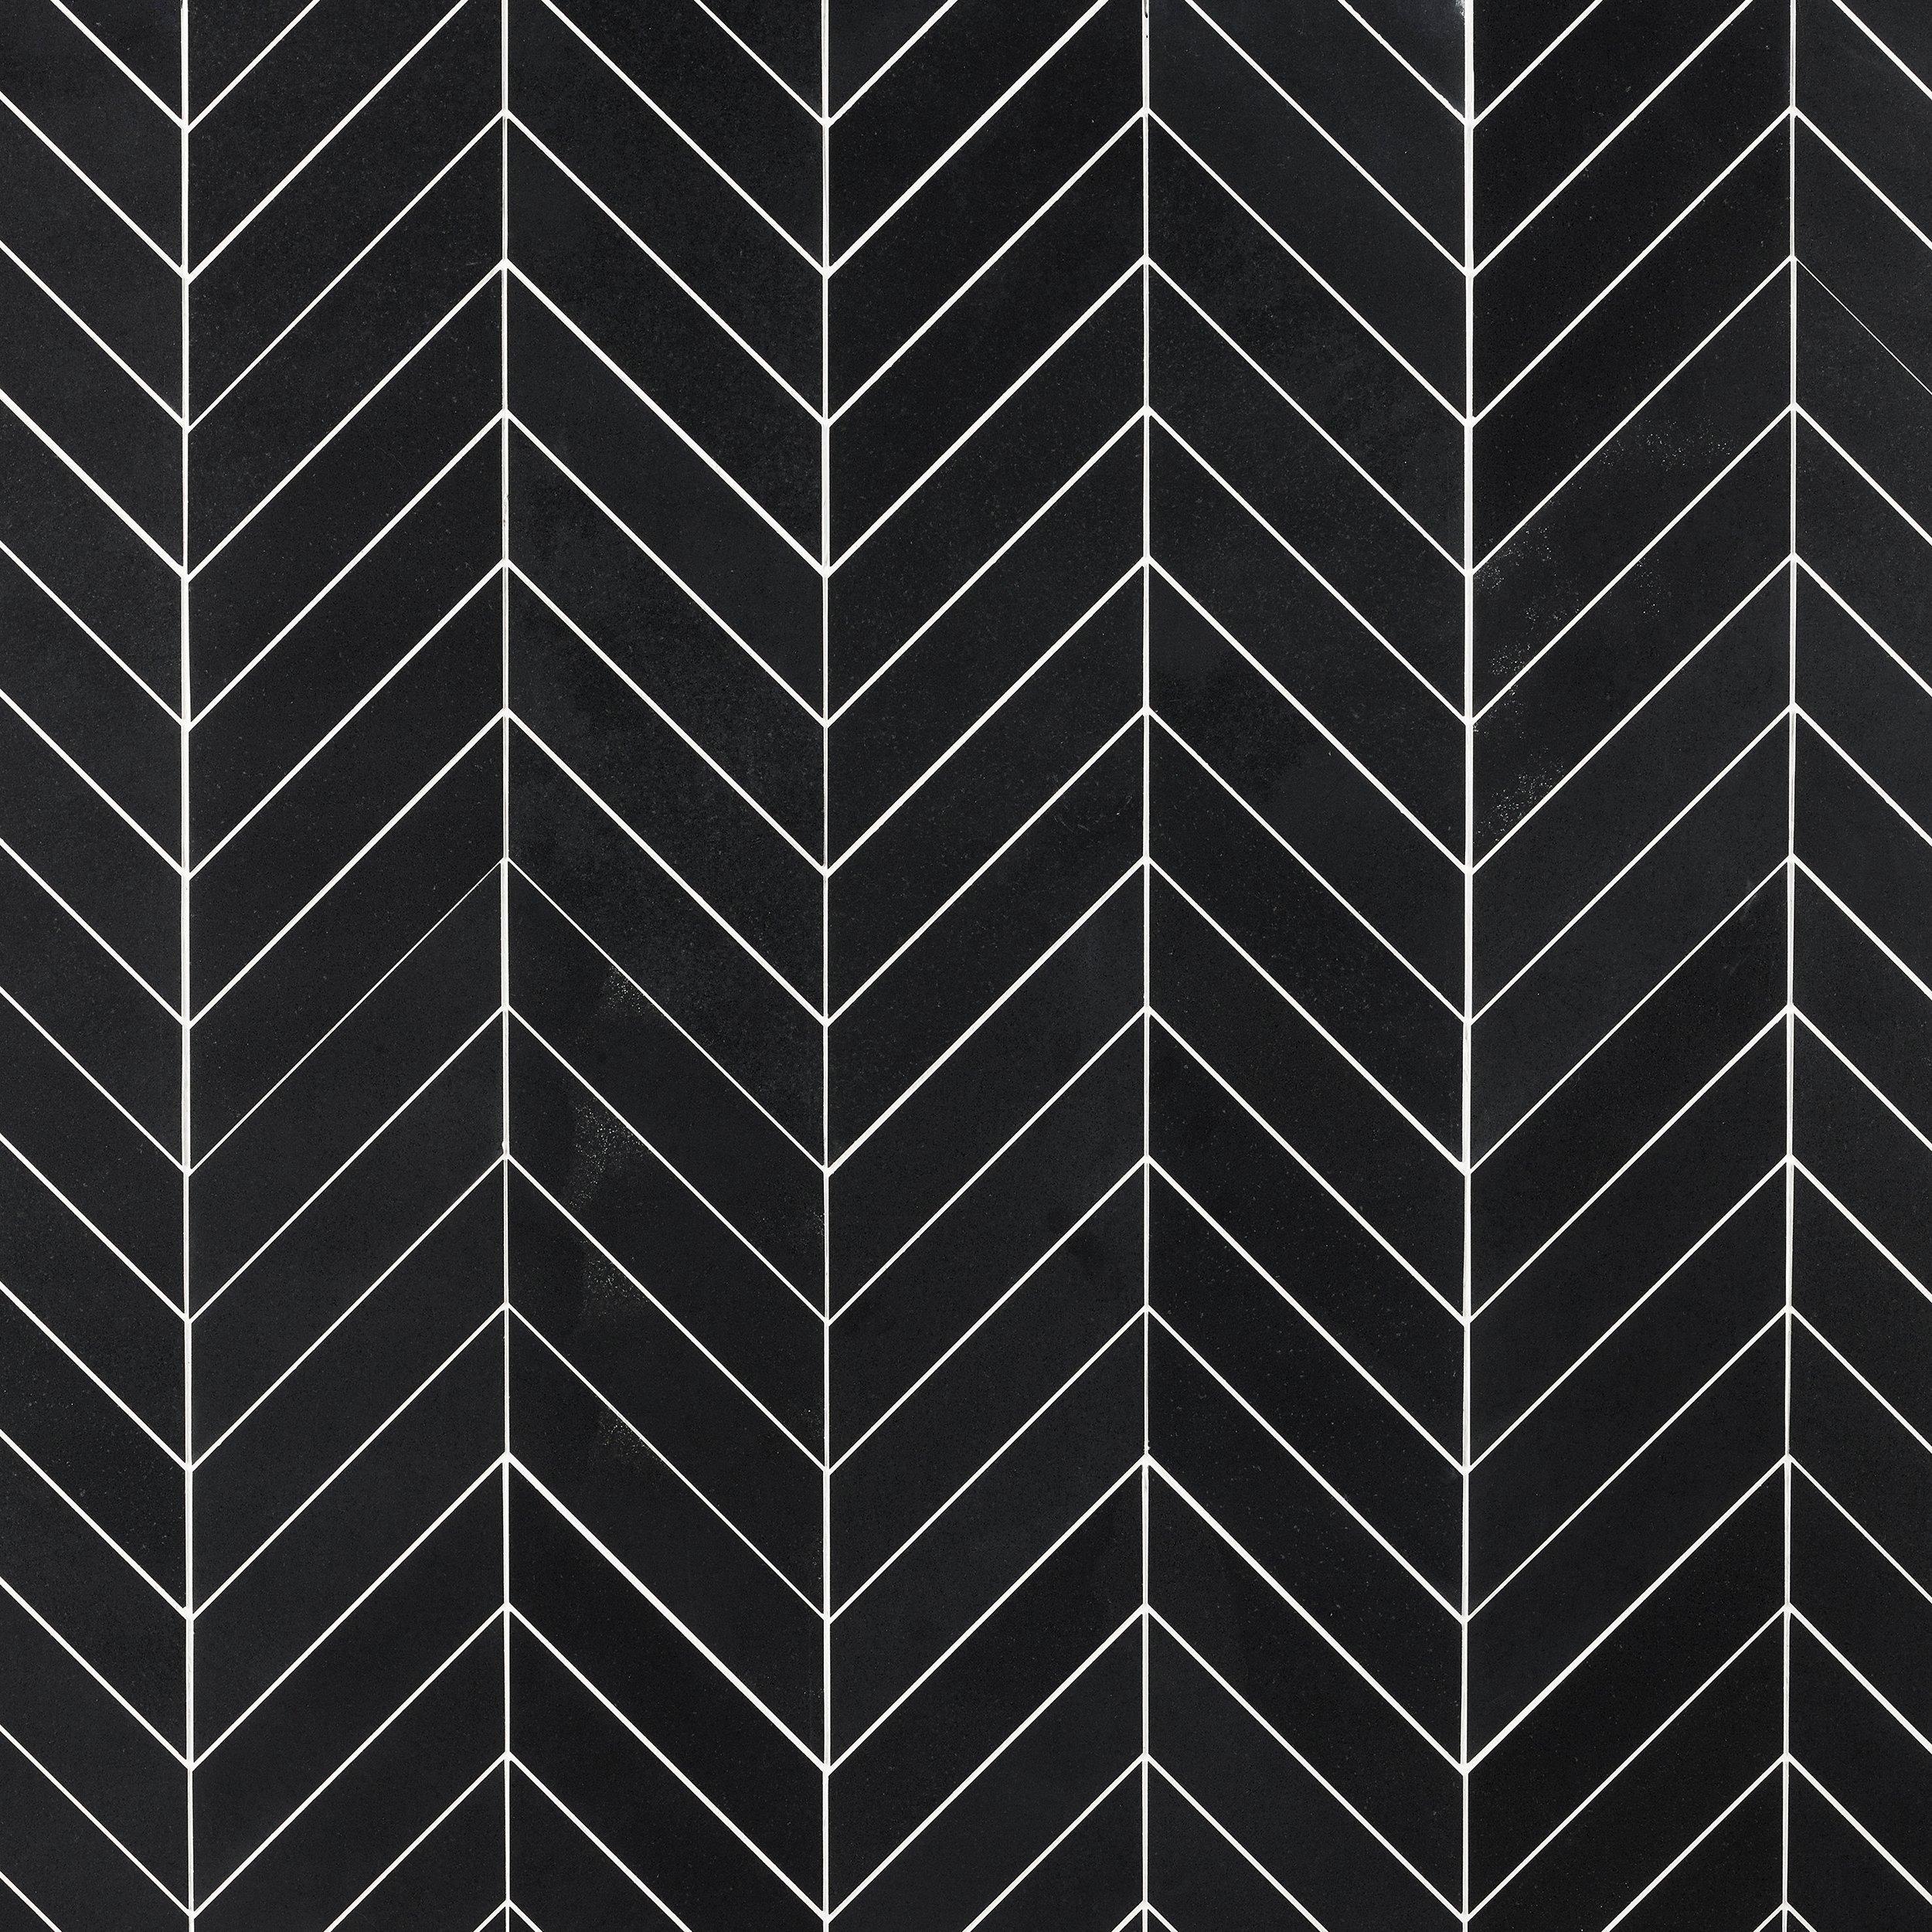 jet black basalt chevron mosaic